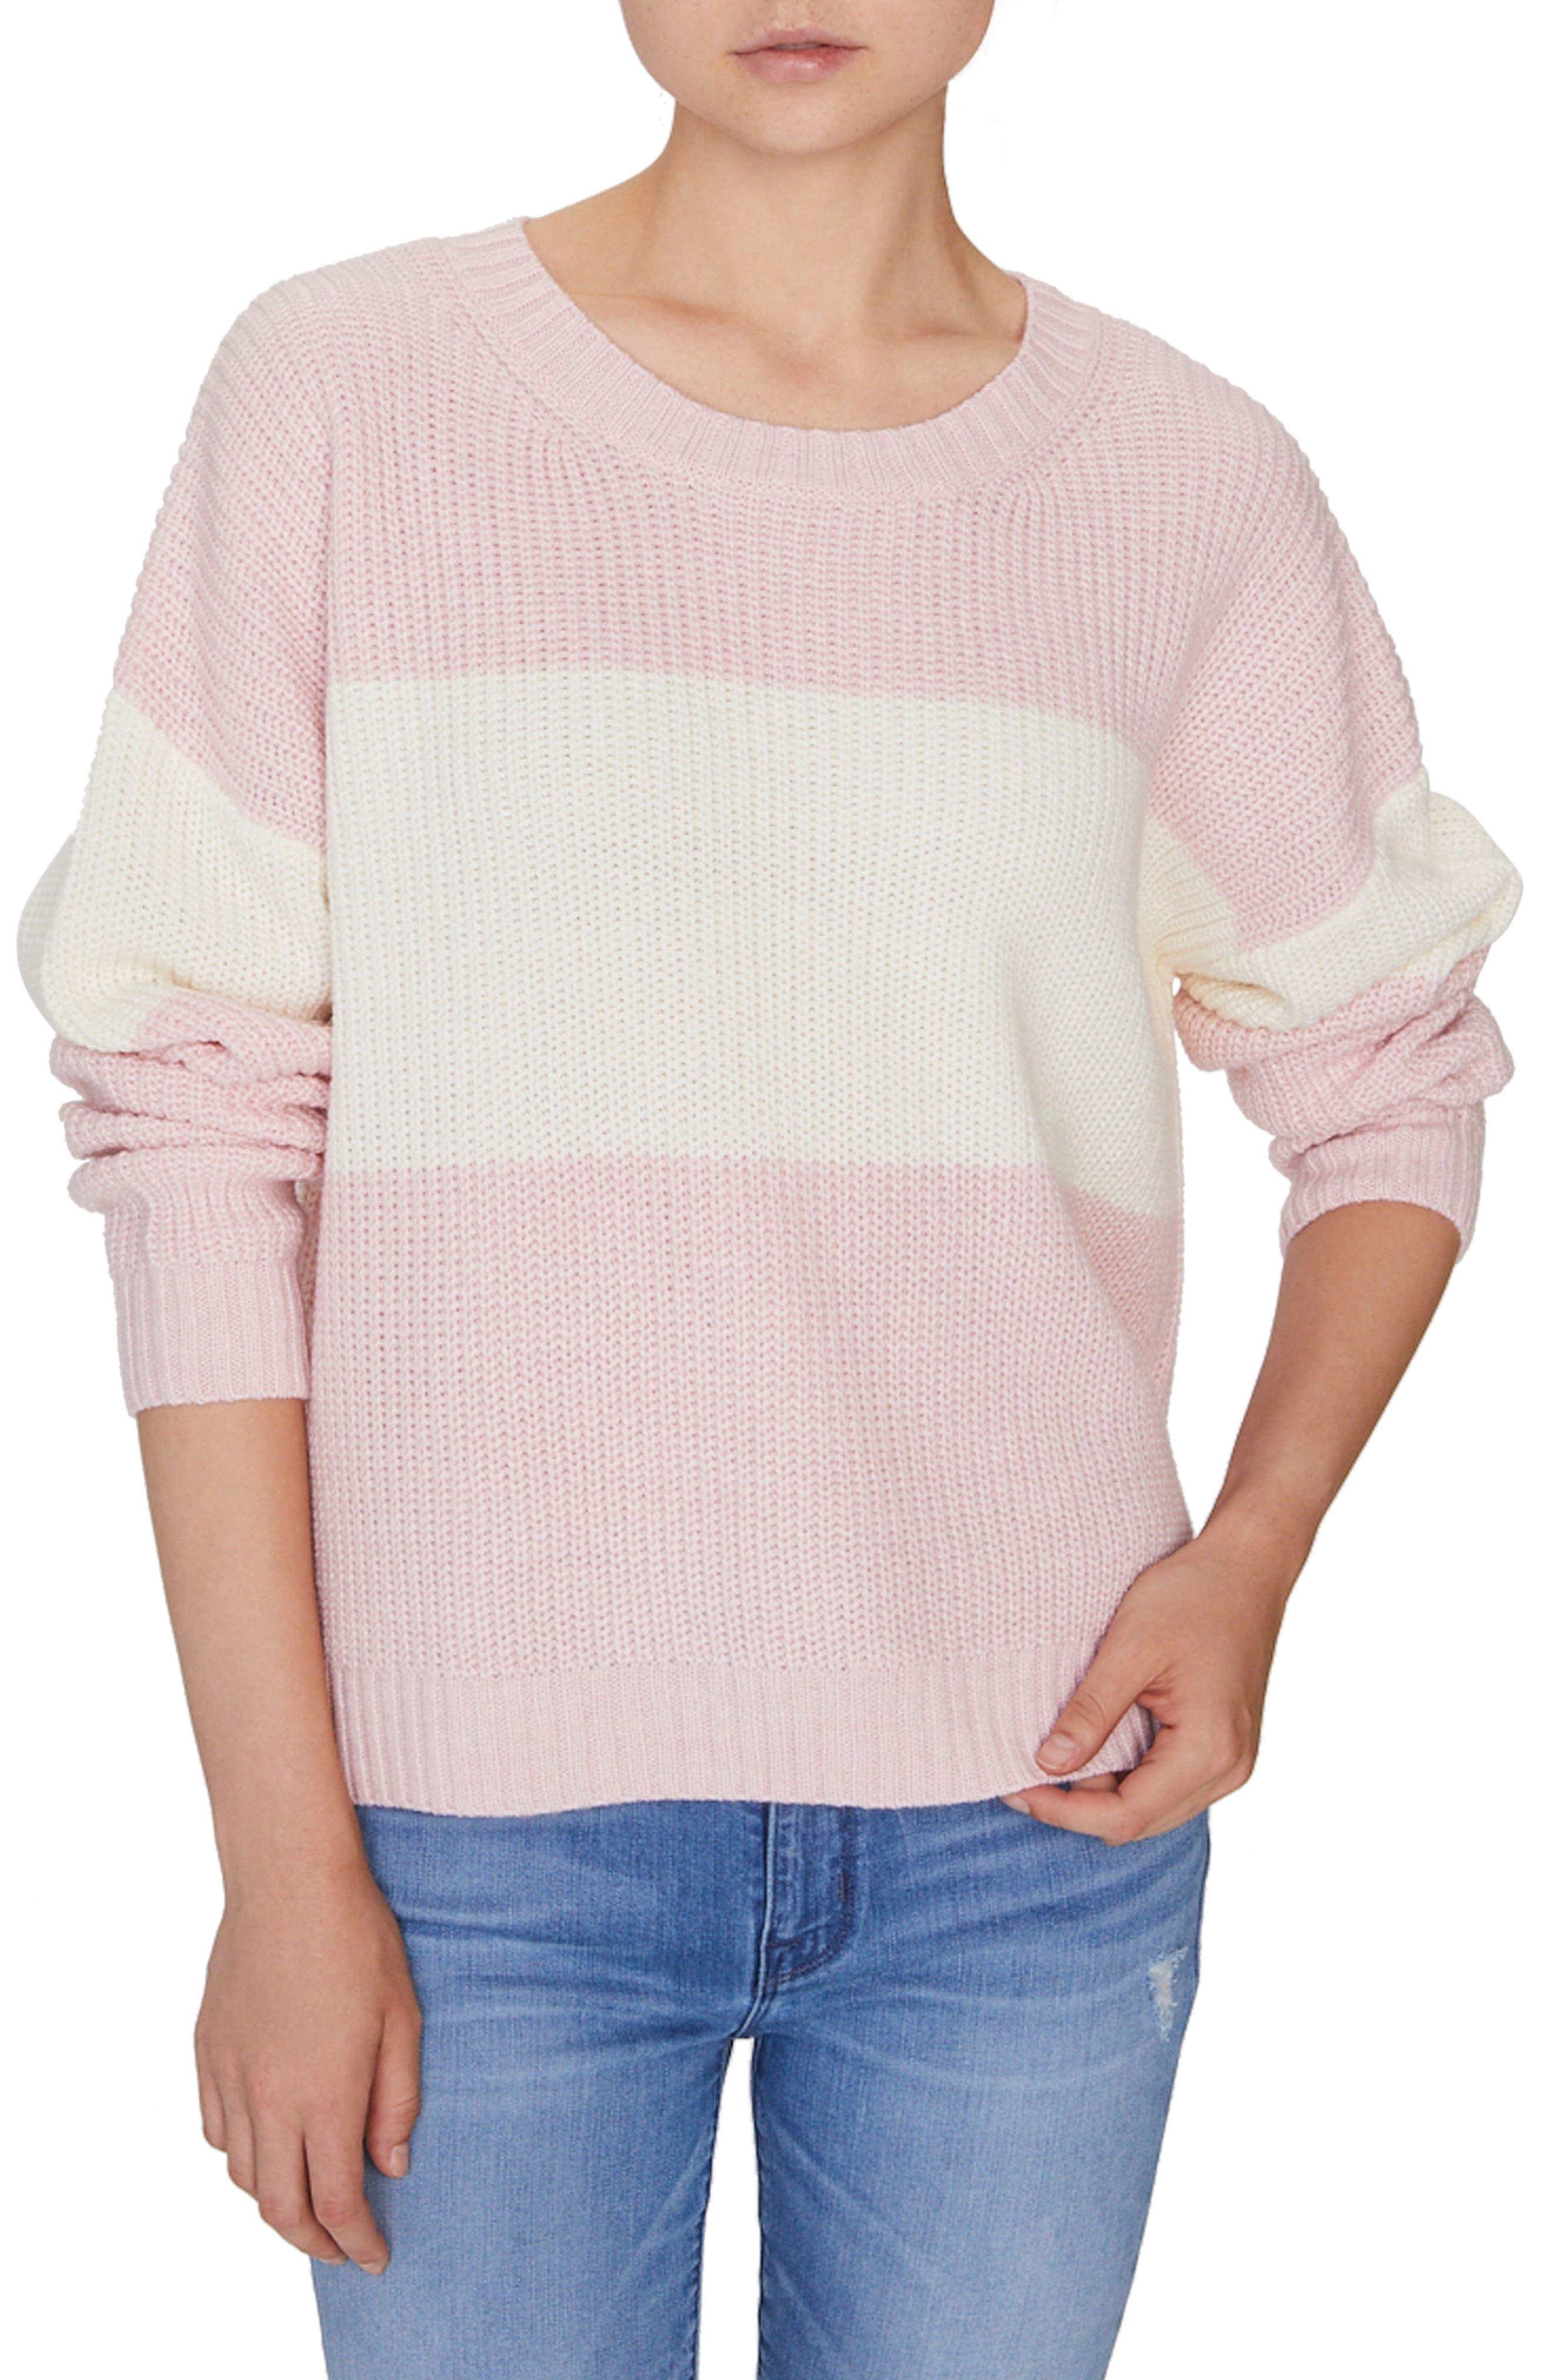 SANCTUARY,                             Billie Colorblock Shaker Sweater,                             Main thumbnail 1, color,                             HEATHER CHERRYBLOSSOM/ NATURAL